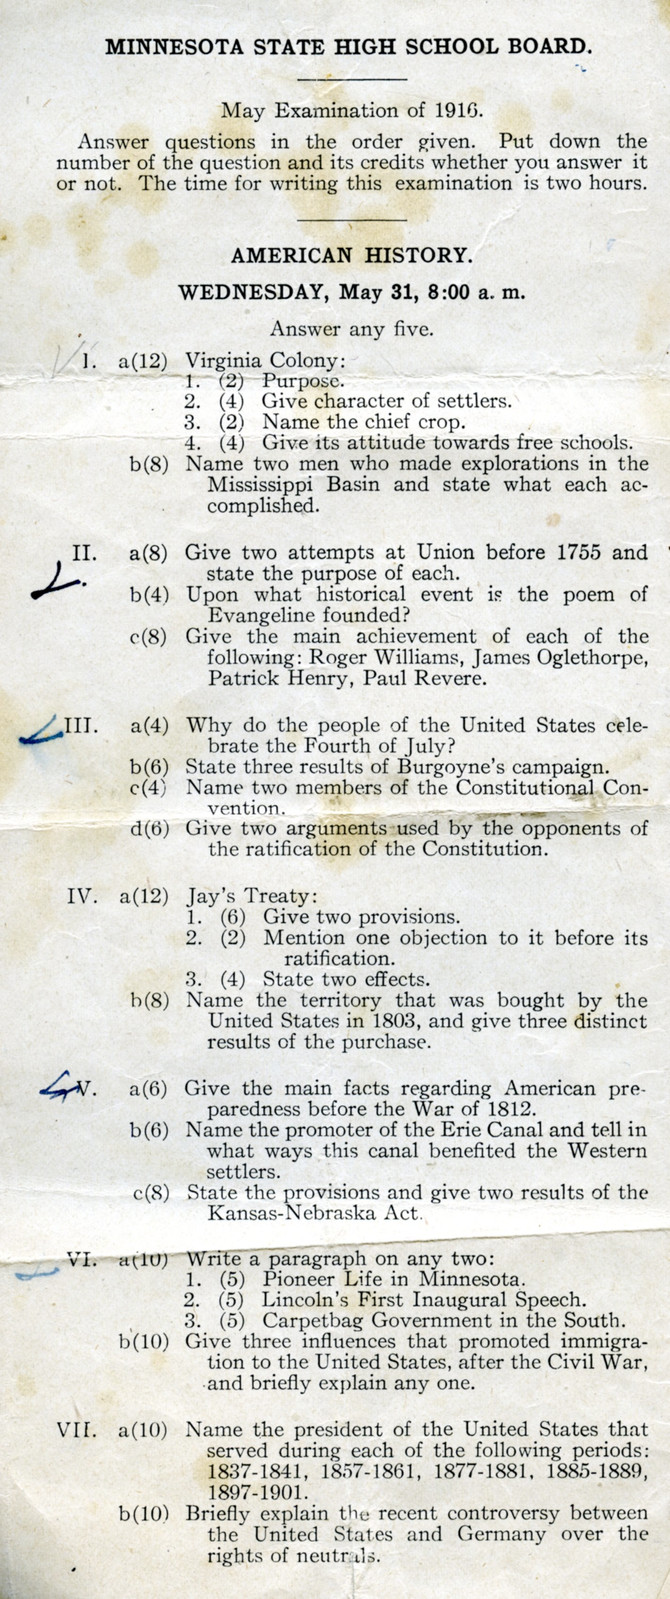 1916 Minnesota State High School Board Examinations